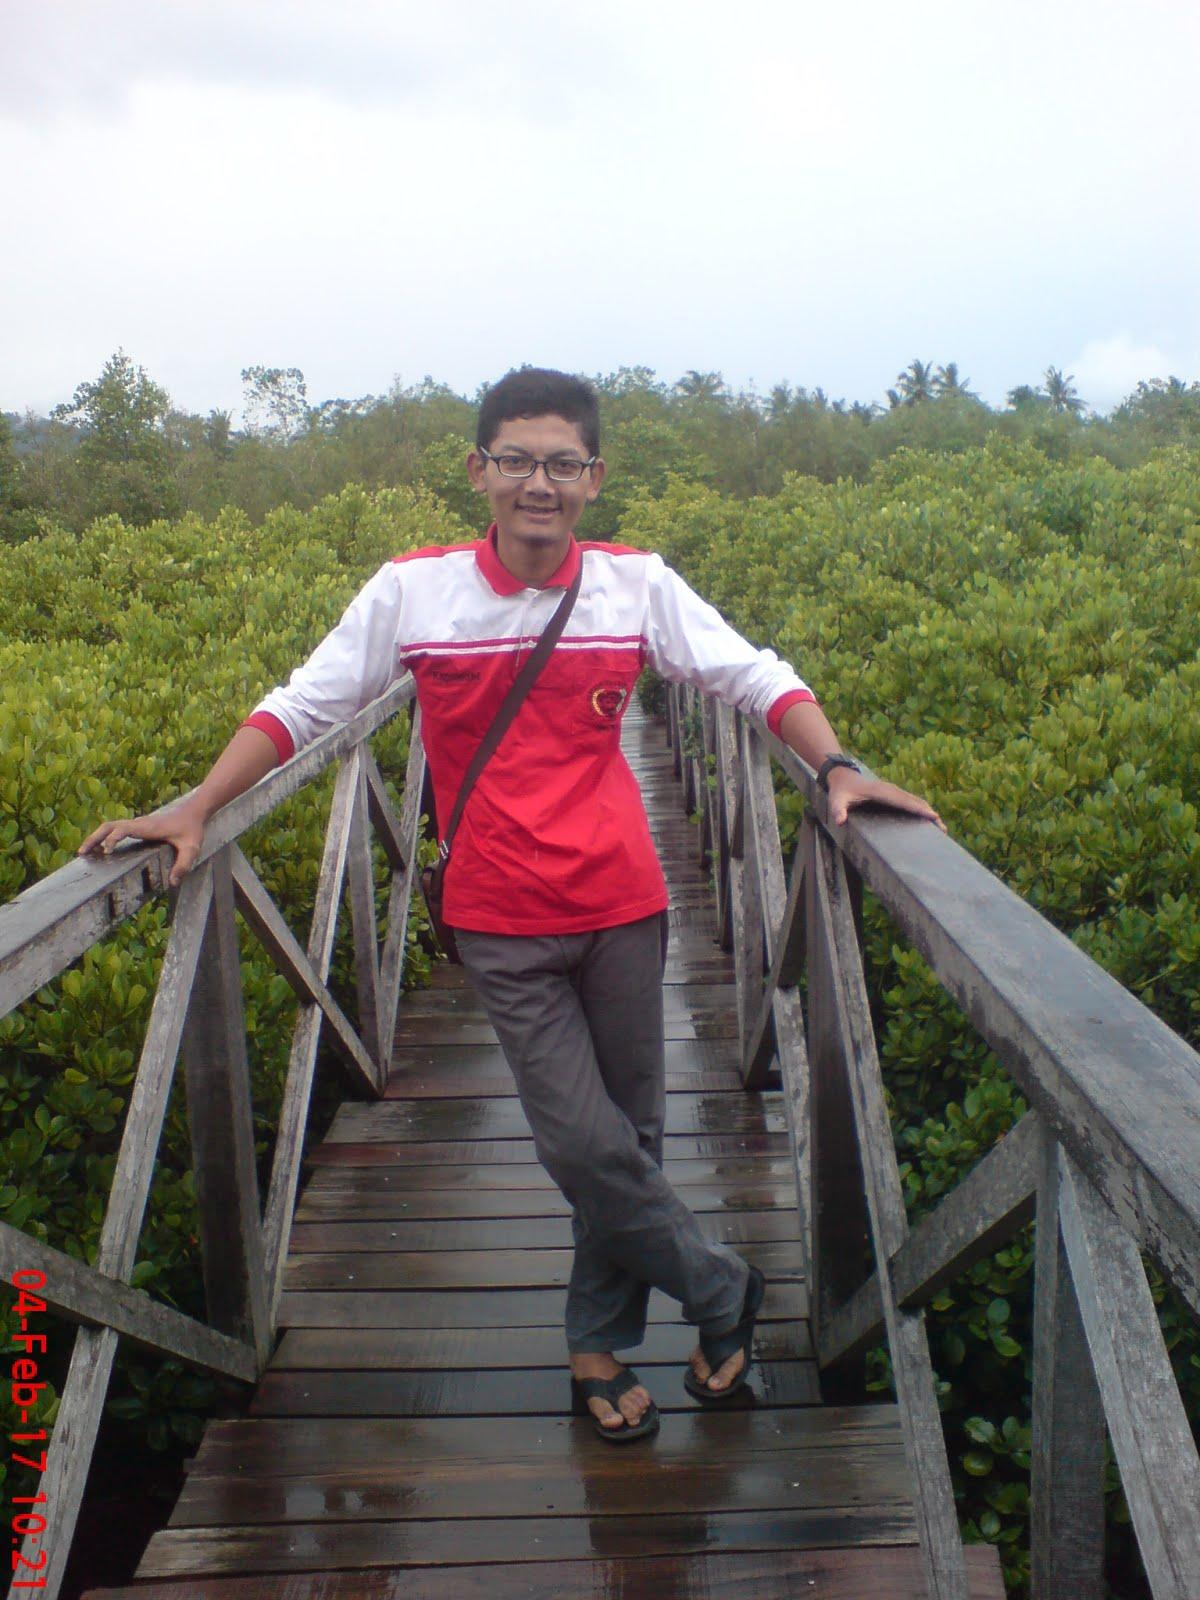 Nanang Fauzi's Little Blog: Outbond di Hutan Mangrove dan Pantai Pasir Putih Trenggalek